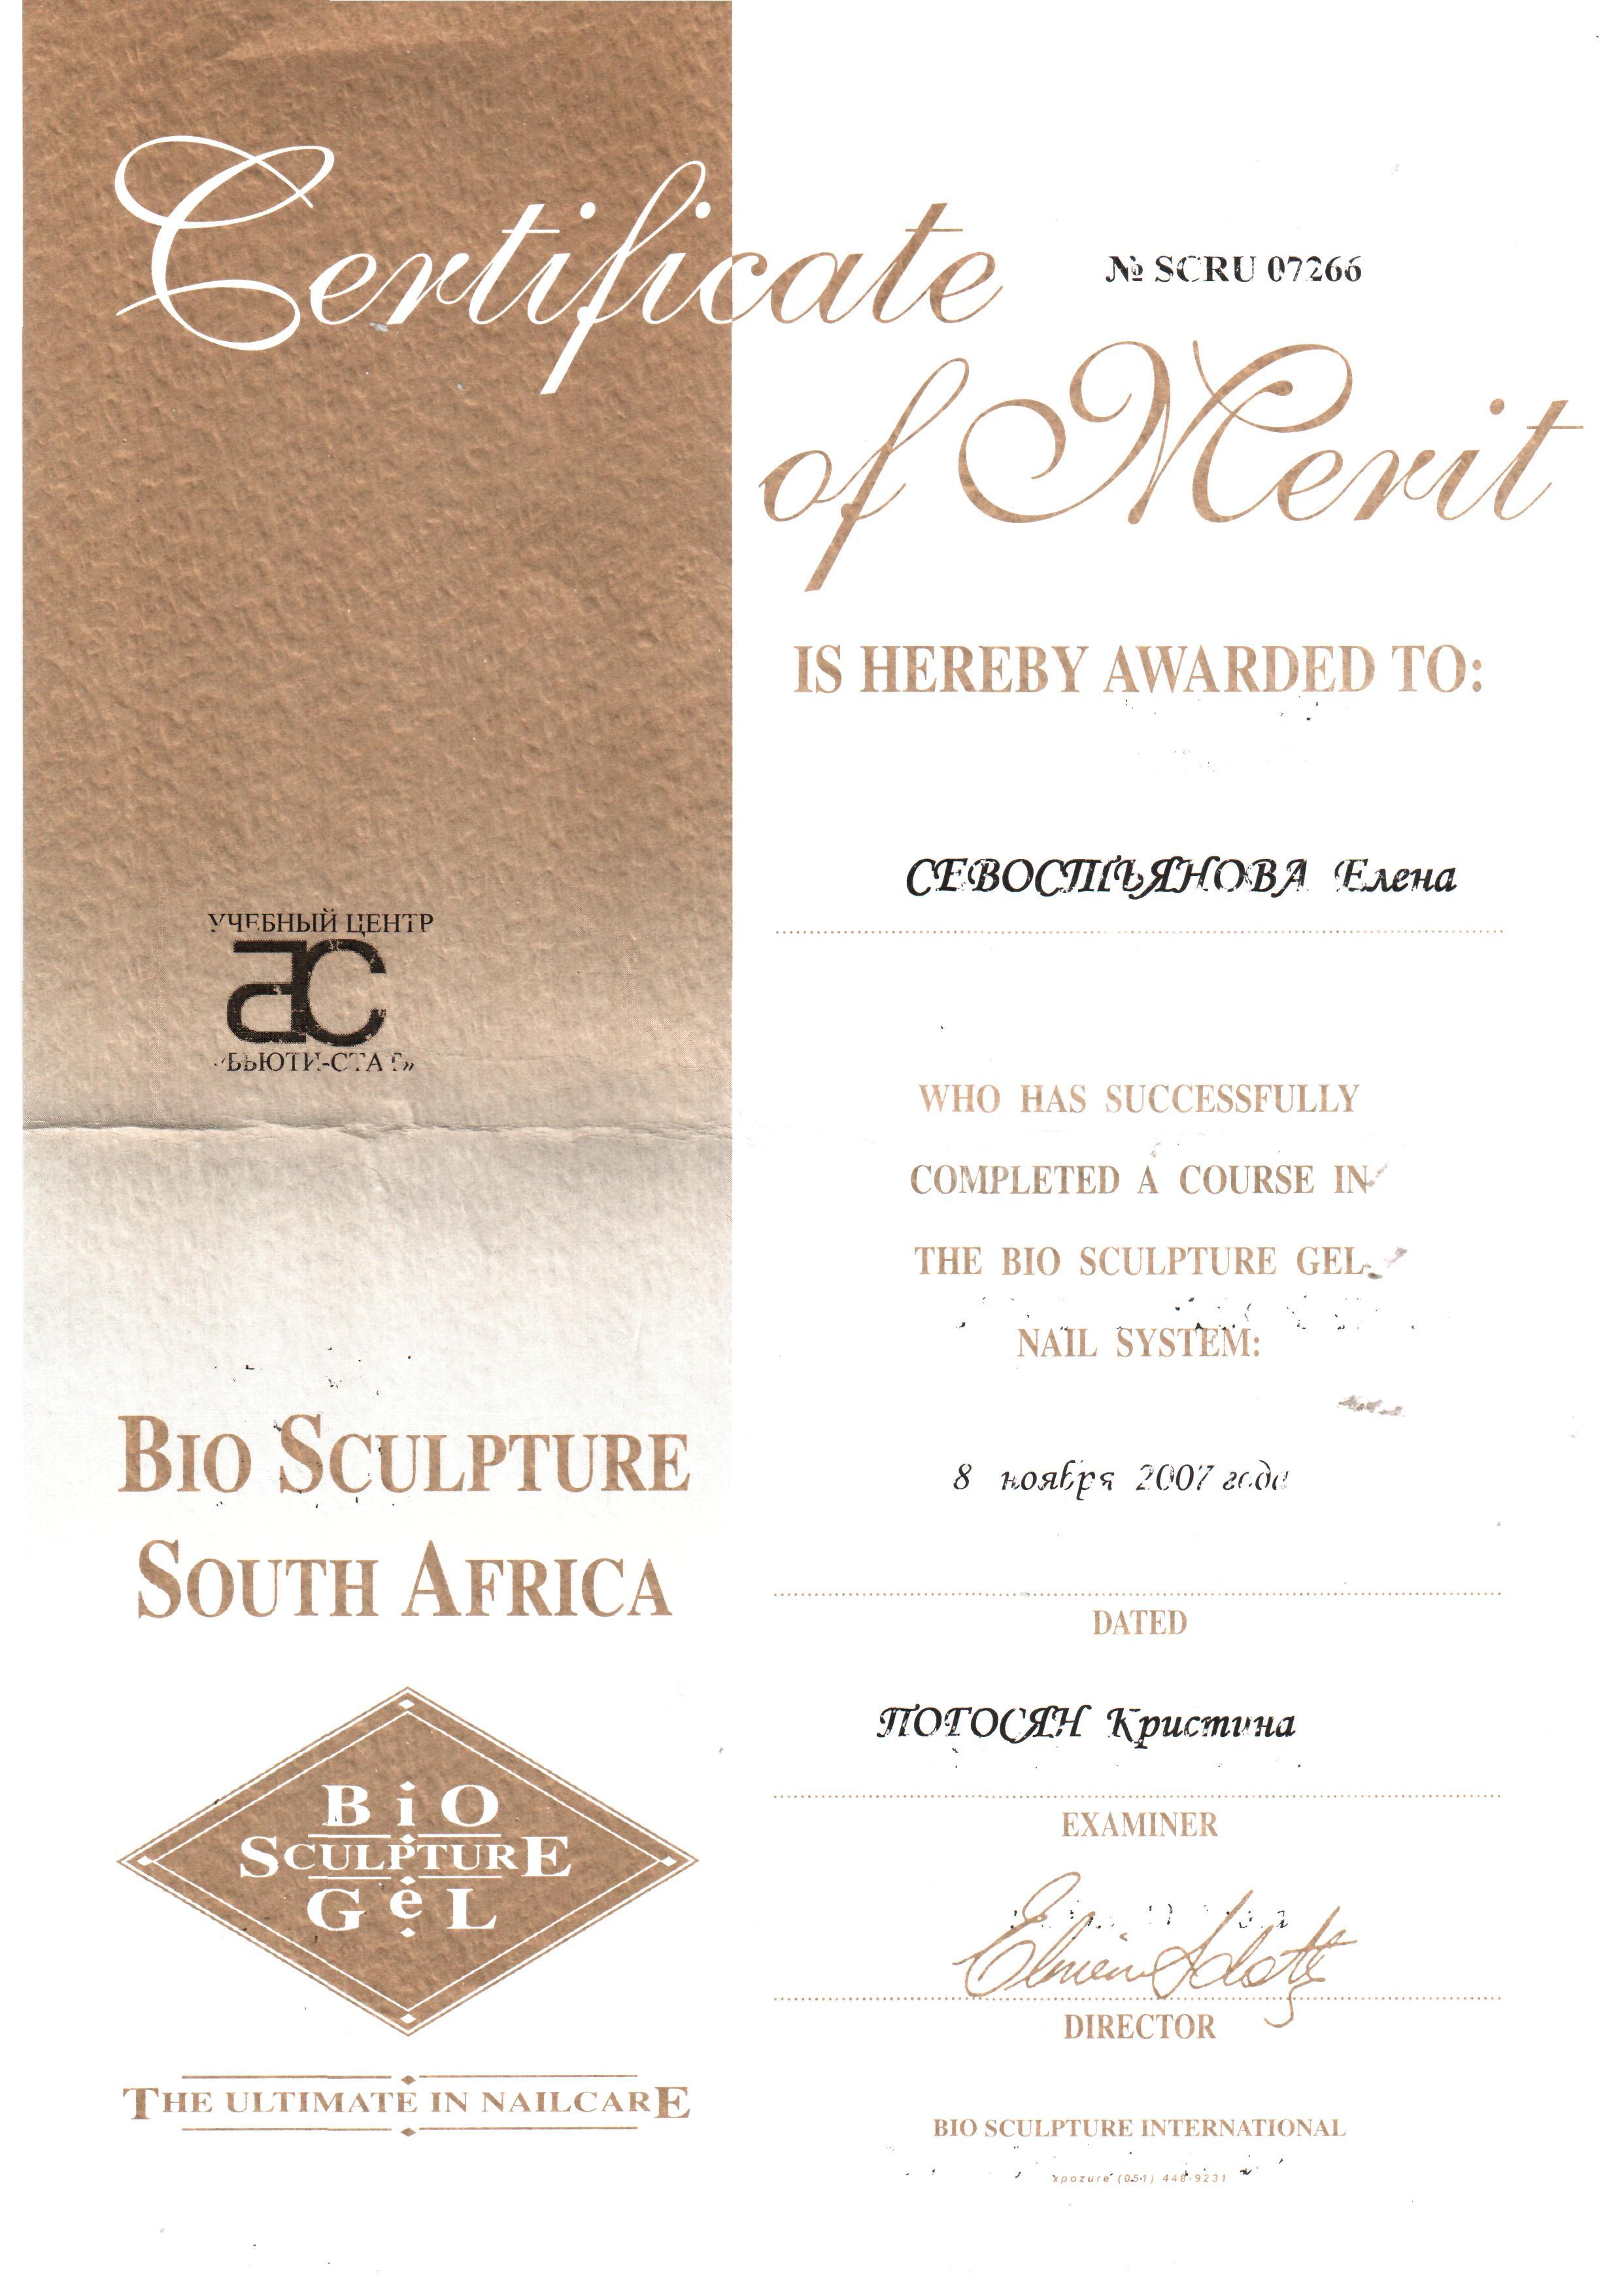 2007 Bio Sculpture